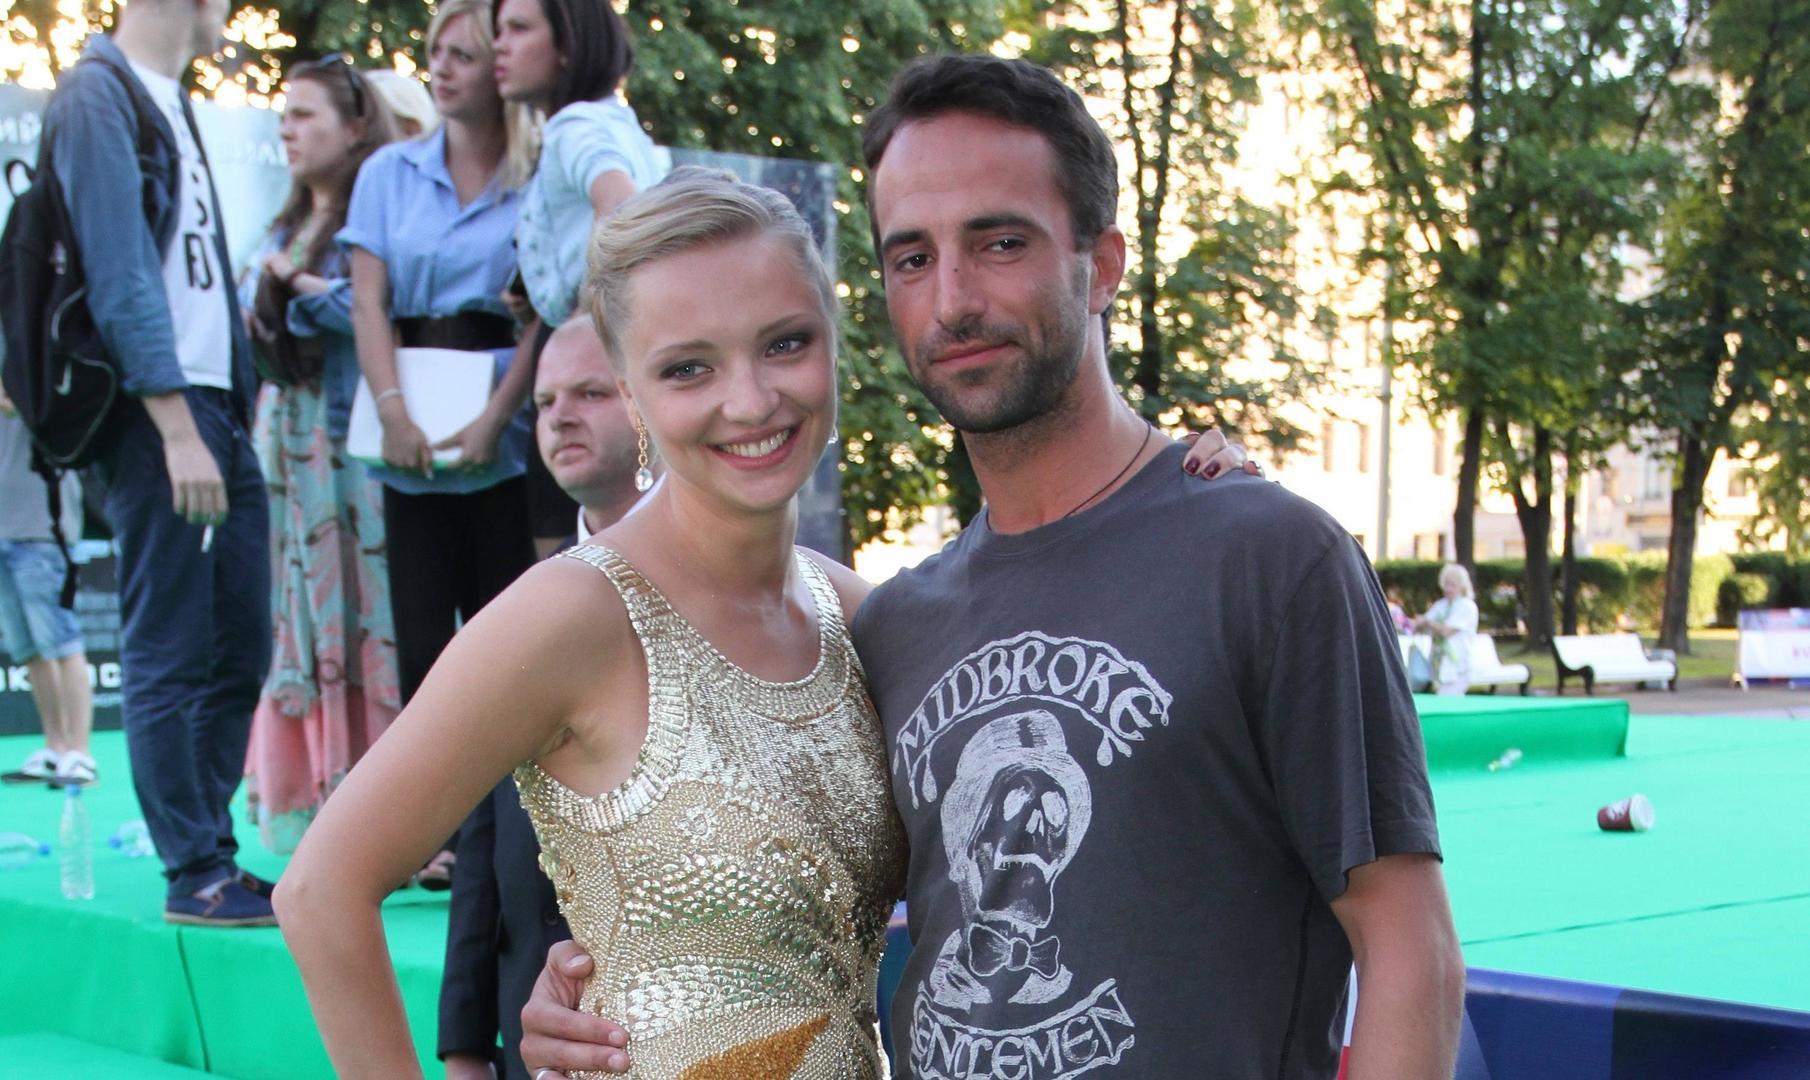 Екатерина Вилкова дала совместное интервью с мужем